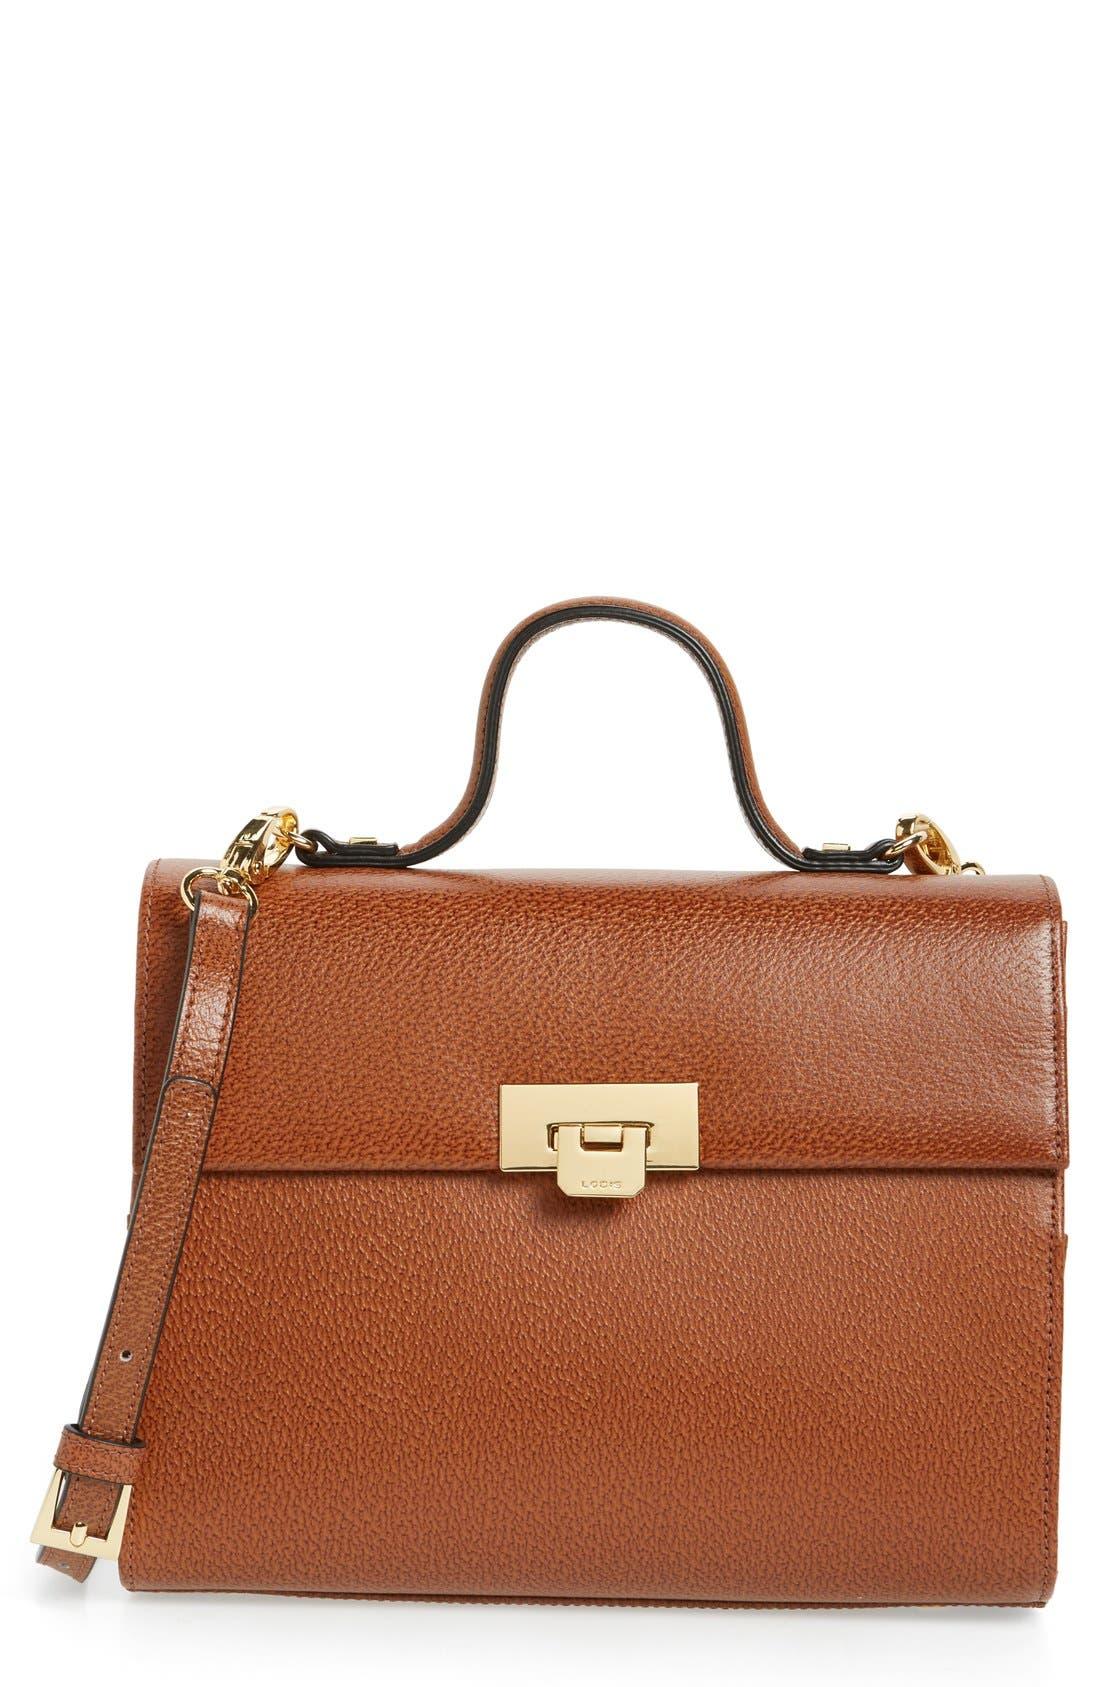 Lodis Medium Bree Leather Top Handle Satchel